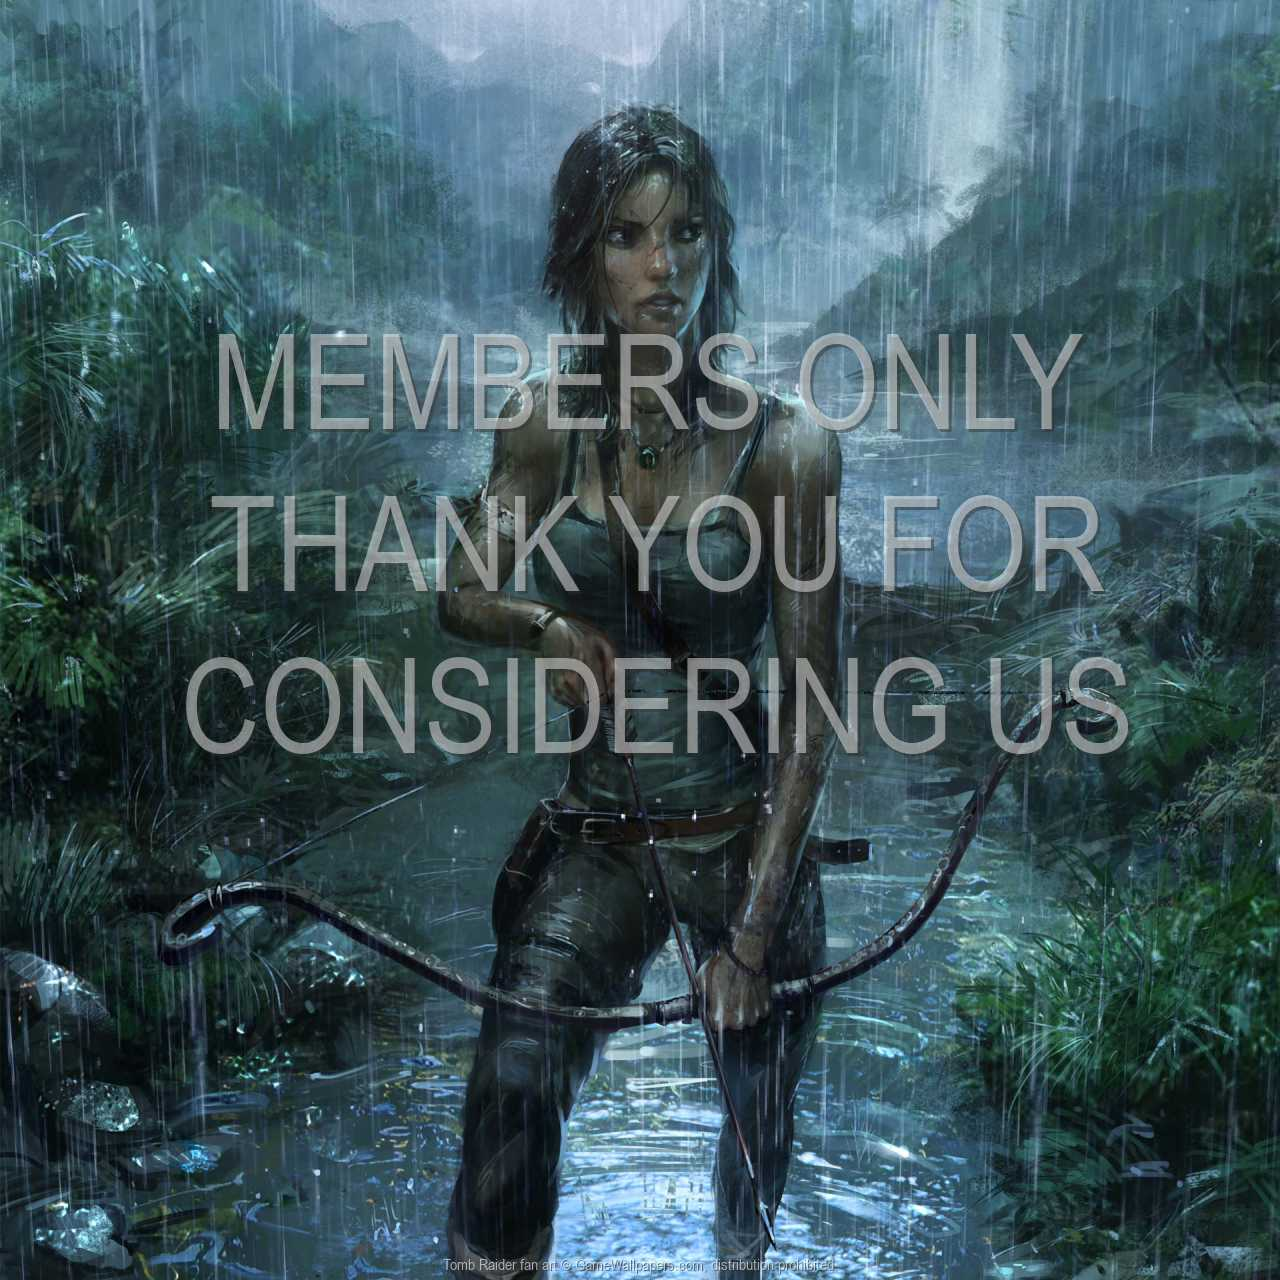 Tomb Raider fan art 720p Horizontal Handy Hintergrundbild 01